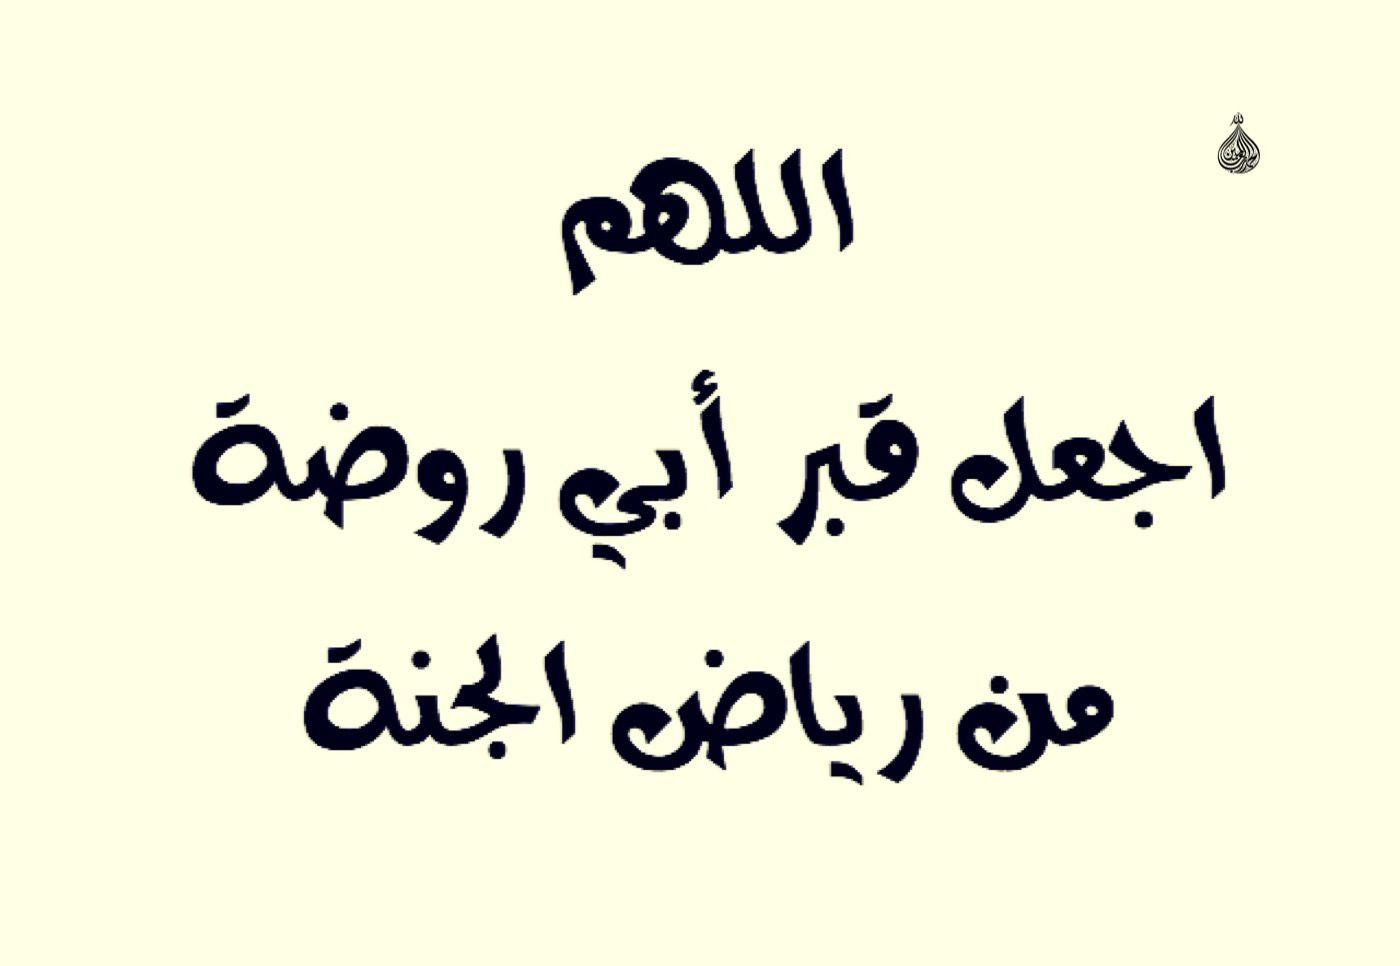 Pin By Yazid Shahin On Du Aa 3 In 2021 Arabic Calligraphy Calligraphy